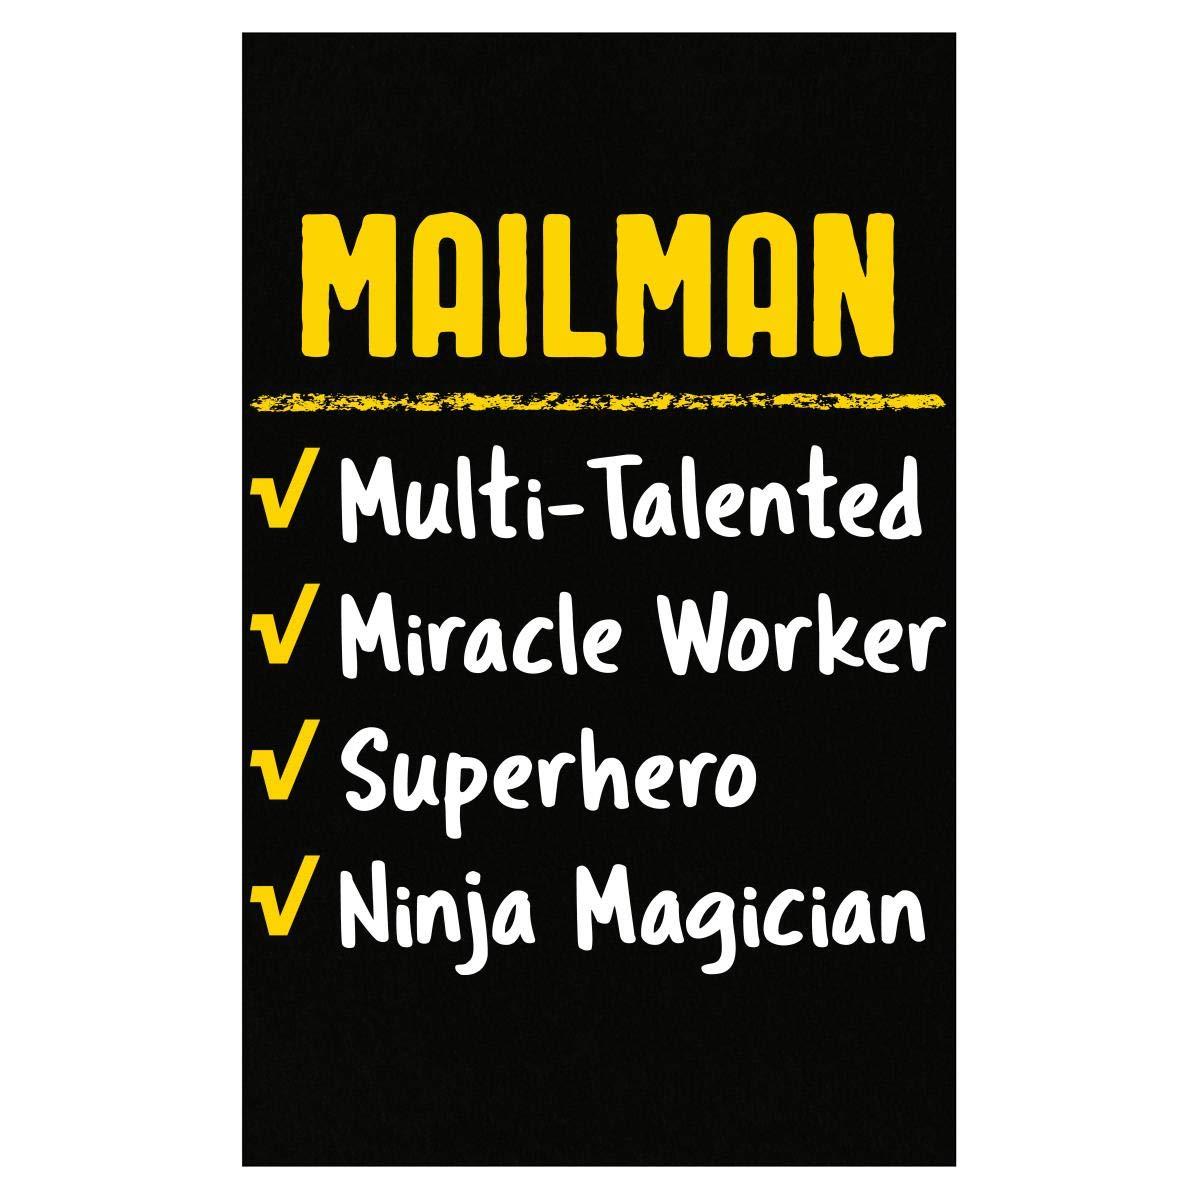 Amazon.com: Mailman Miracle Worker Superhero Ninja Funny ...